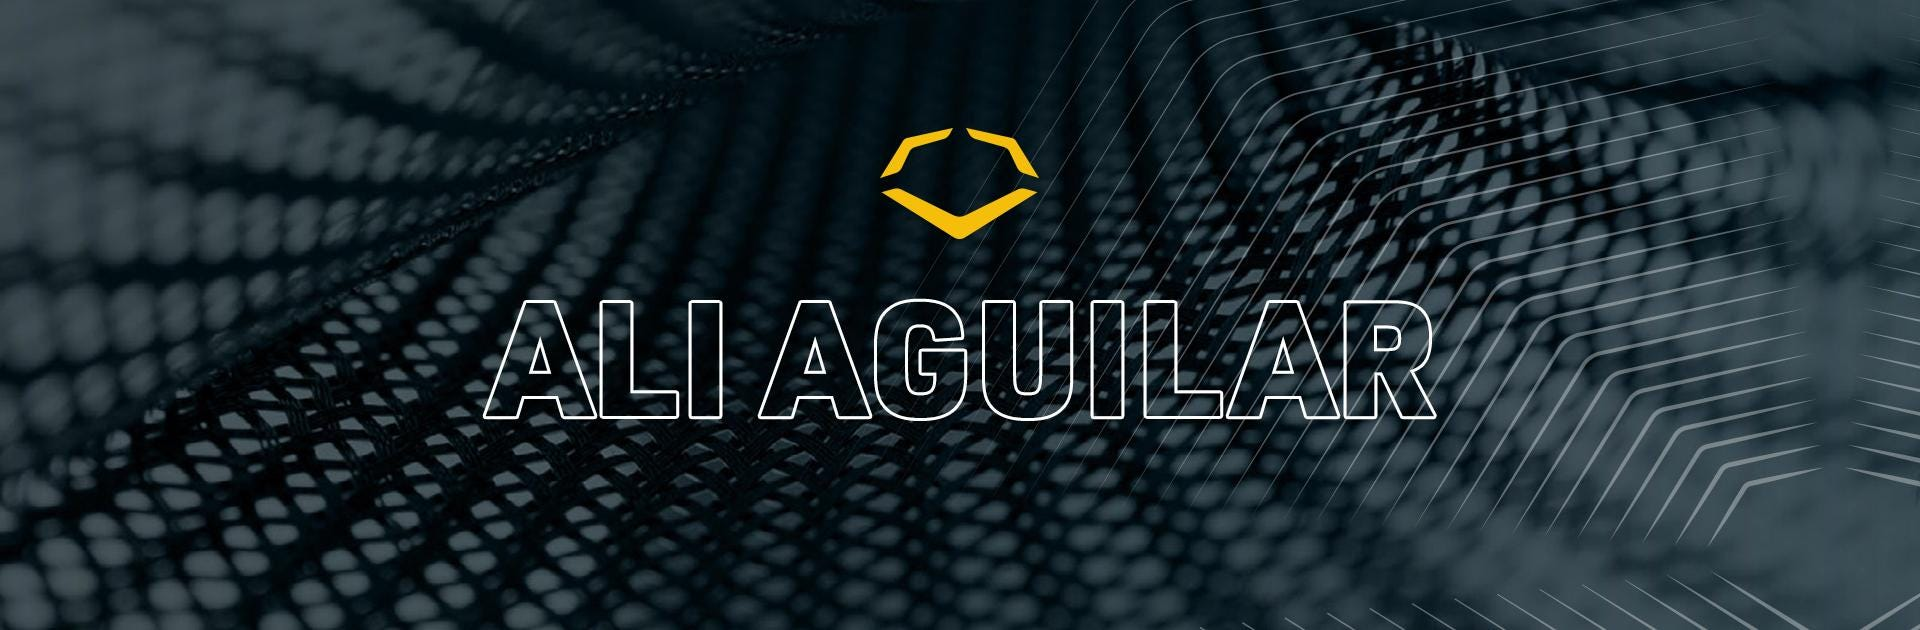 EvoShield-Elbow-Guard-Leg-Guard-Ali-Aguilar-USA-Softball